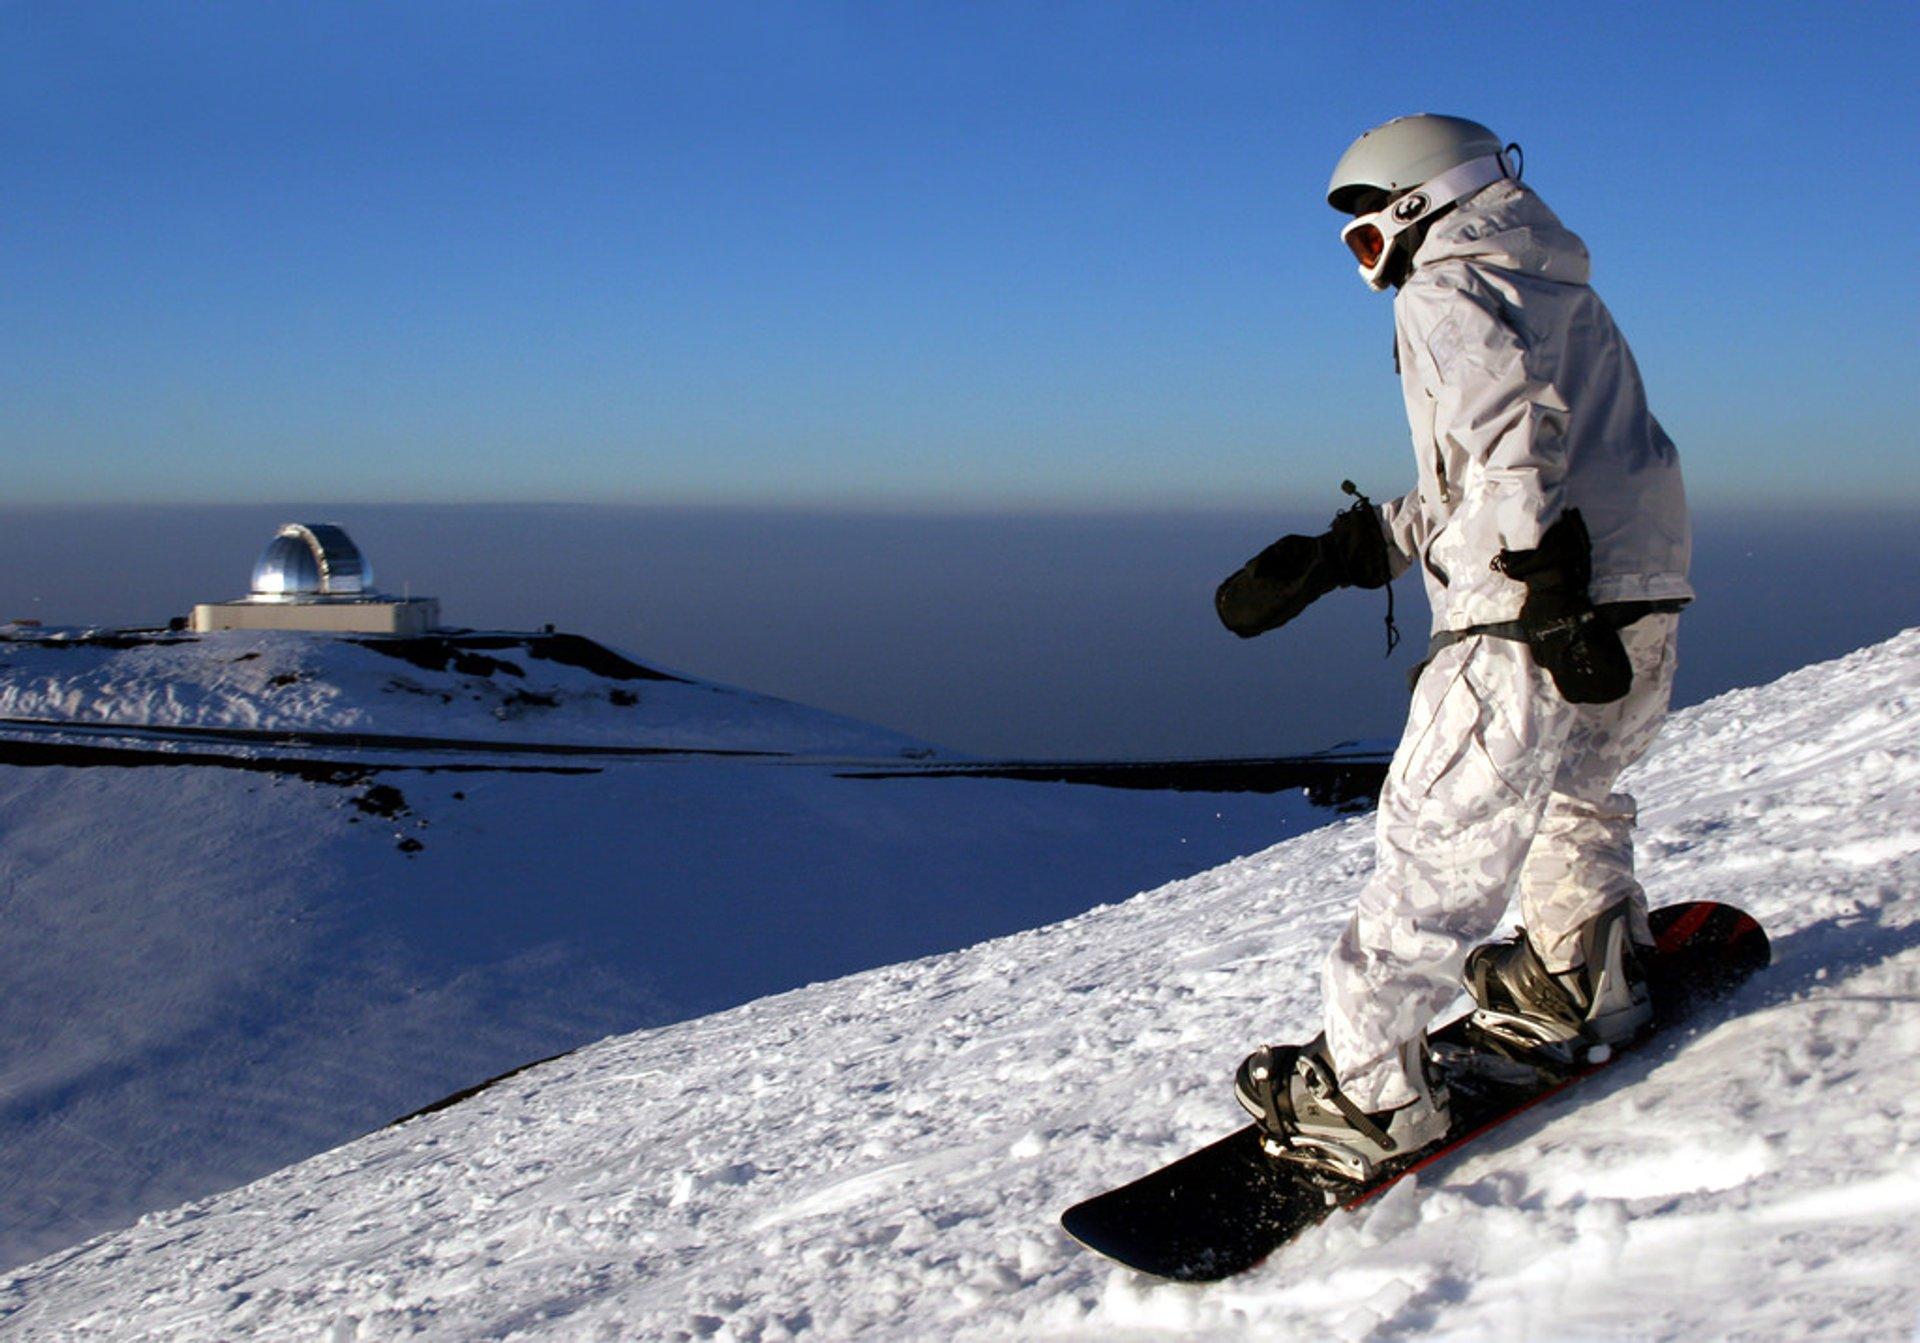 Skiing and Snowboarding Mauna Kea in Hawaii 2020 - Best Time